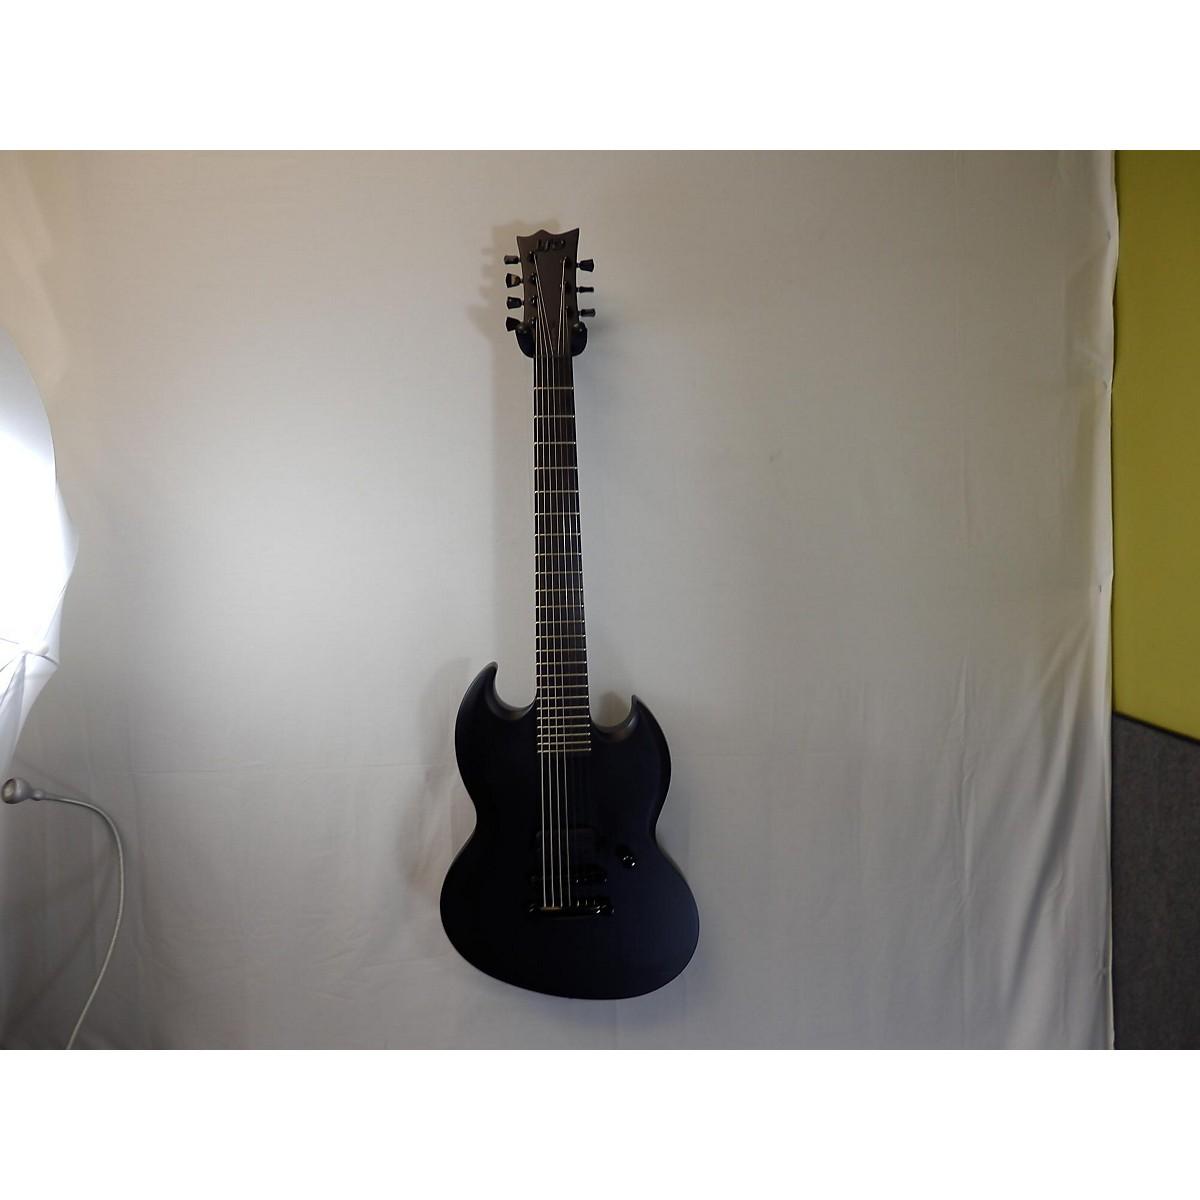 ESP LTD VIPER 7B BARITONE BLACK METAL 7 STRING Solid Body Electric Guitar